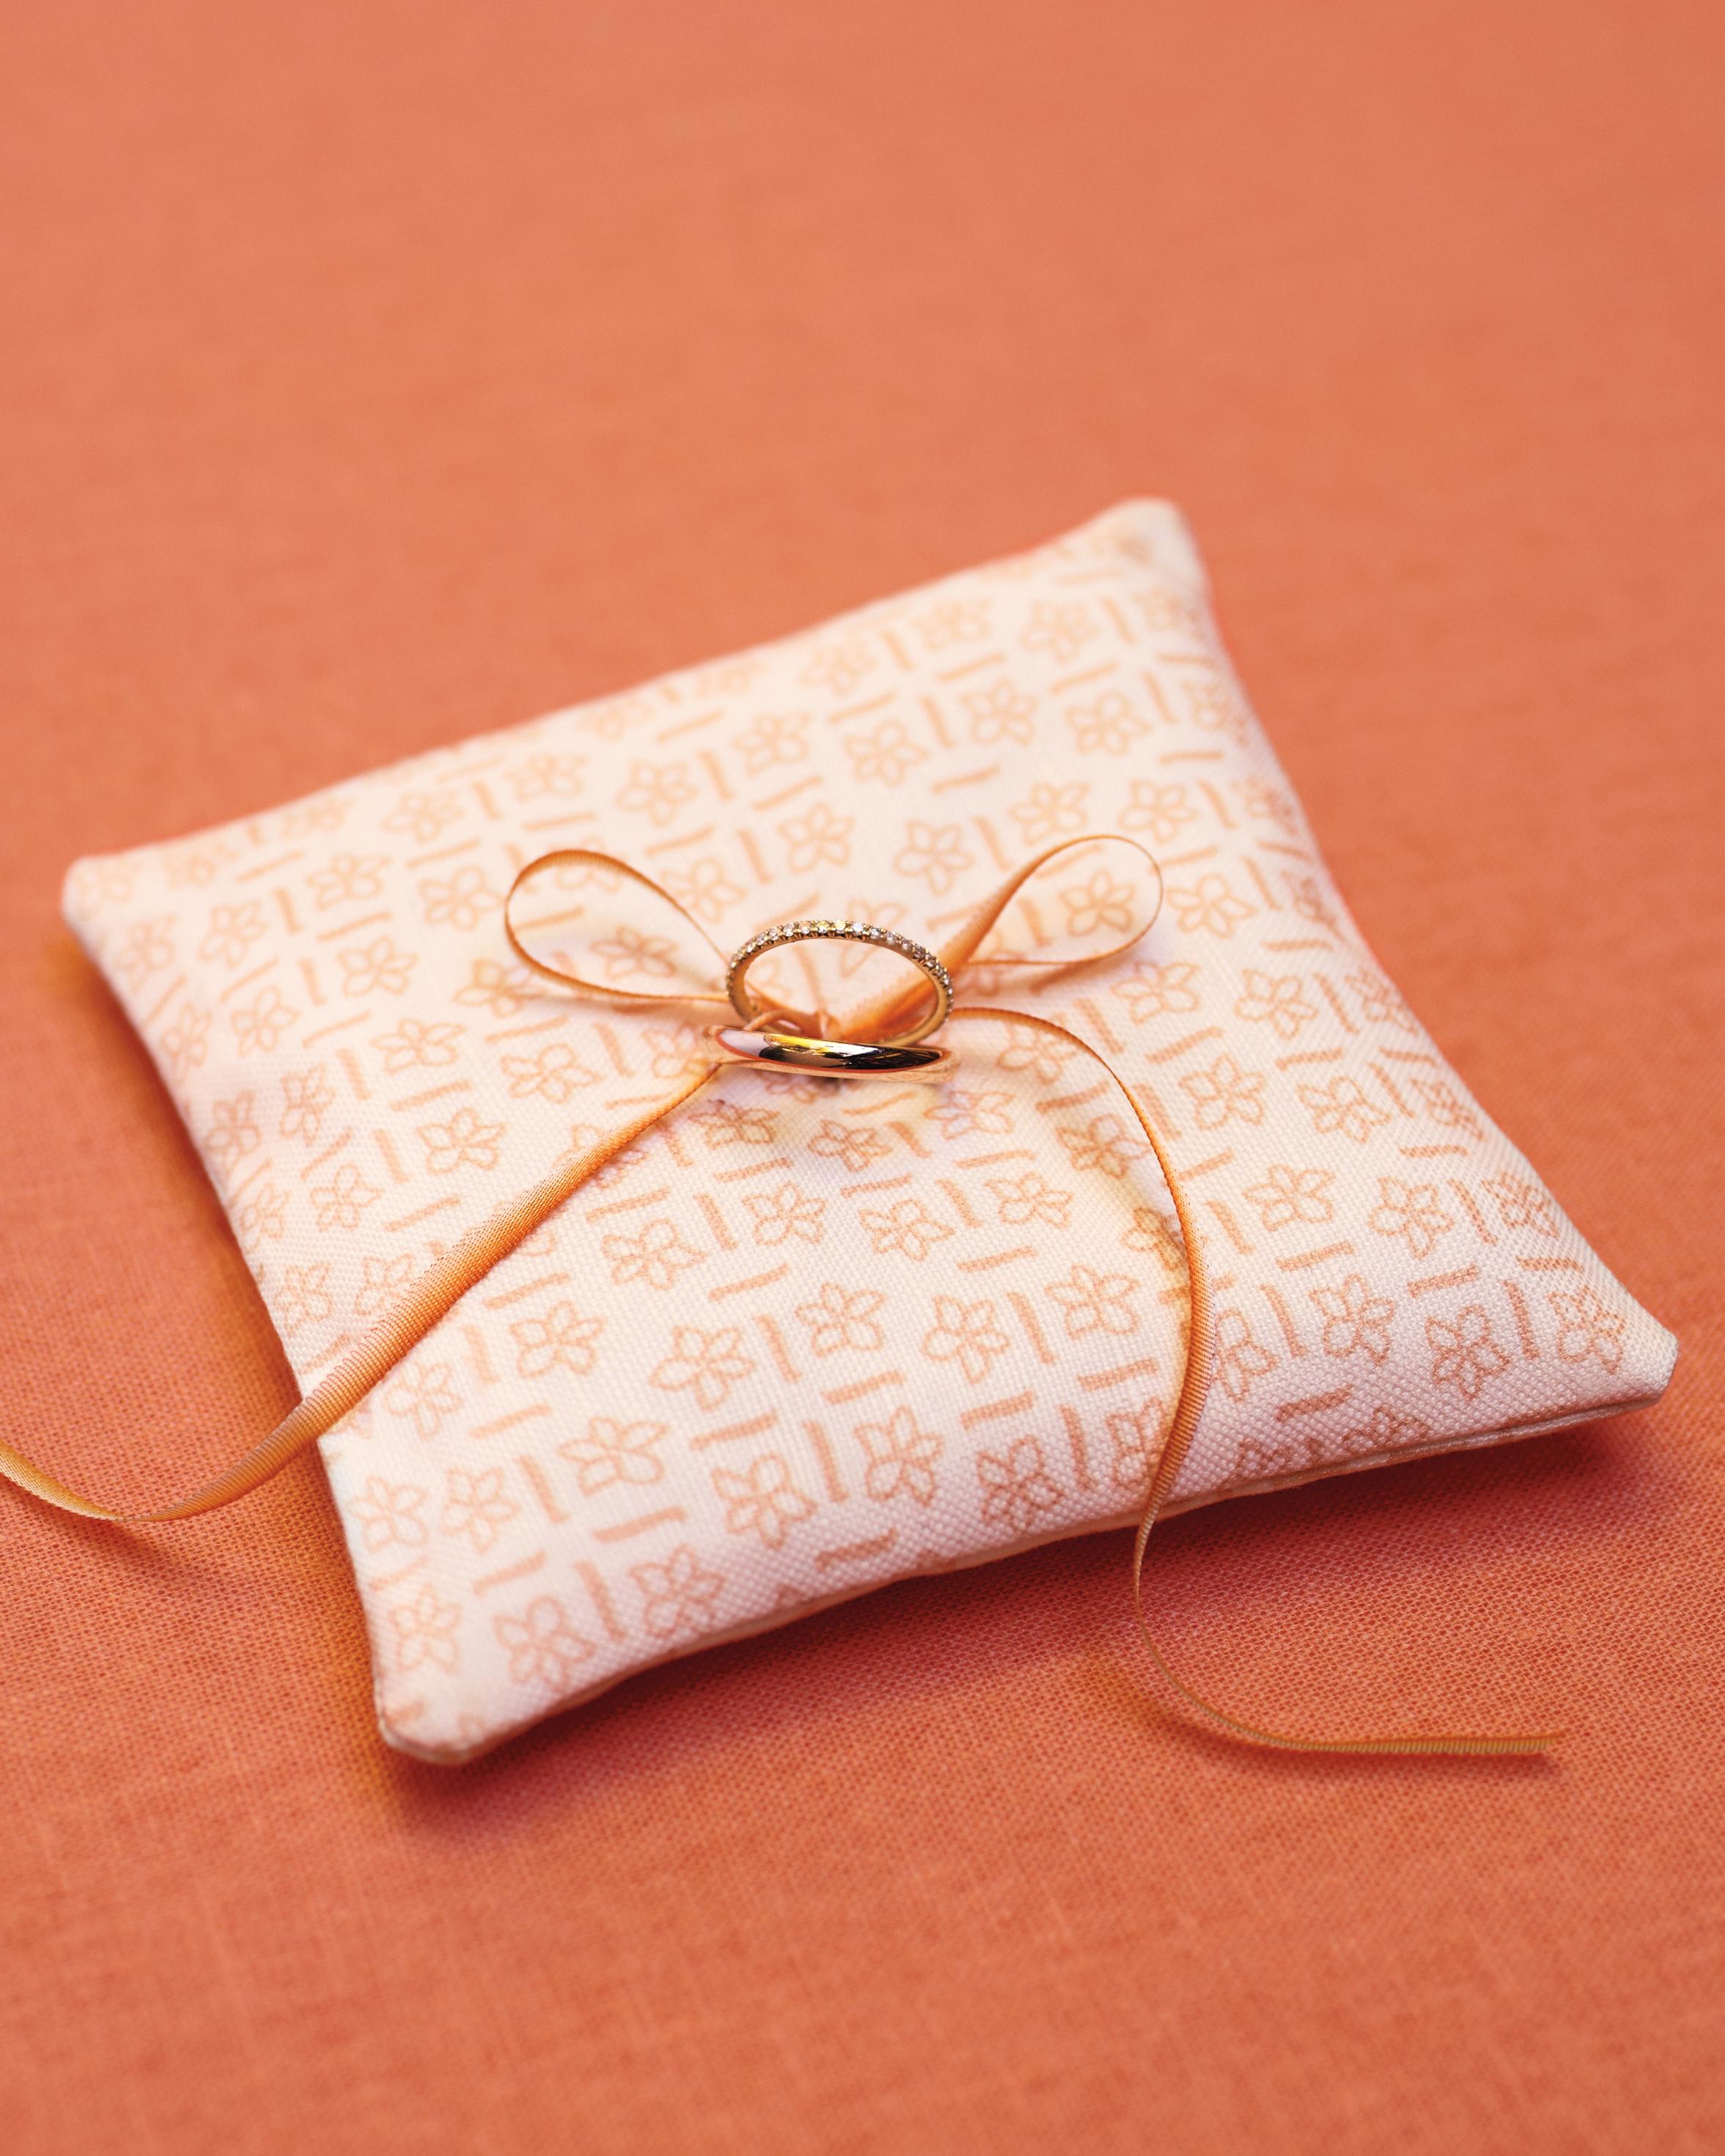 ring-pillows-14-mwd109382.jpg